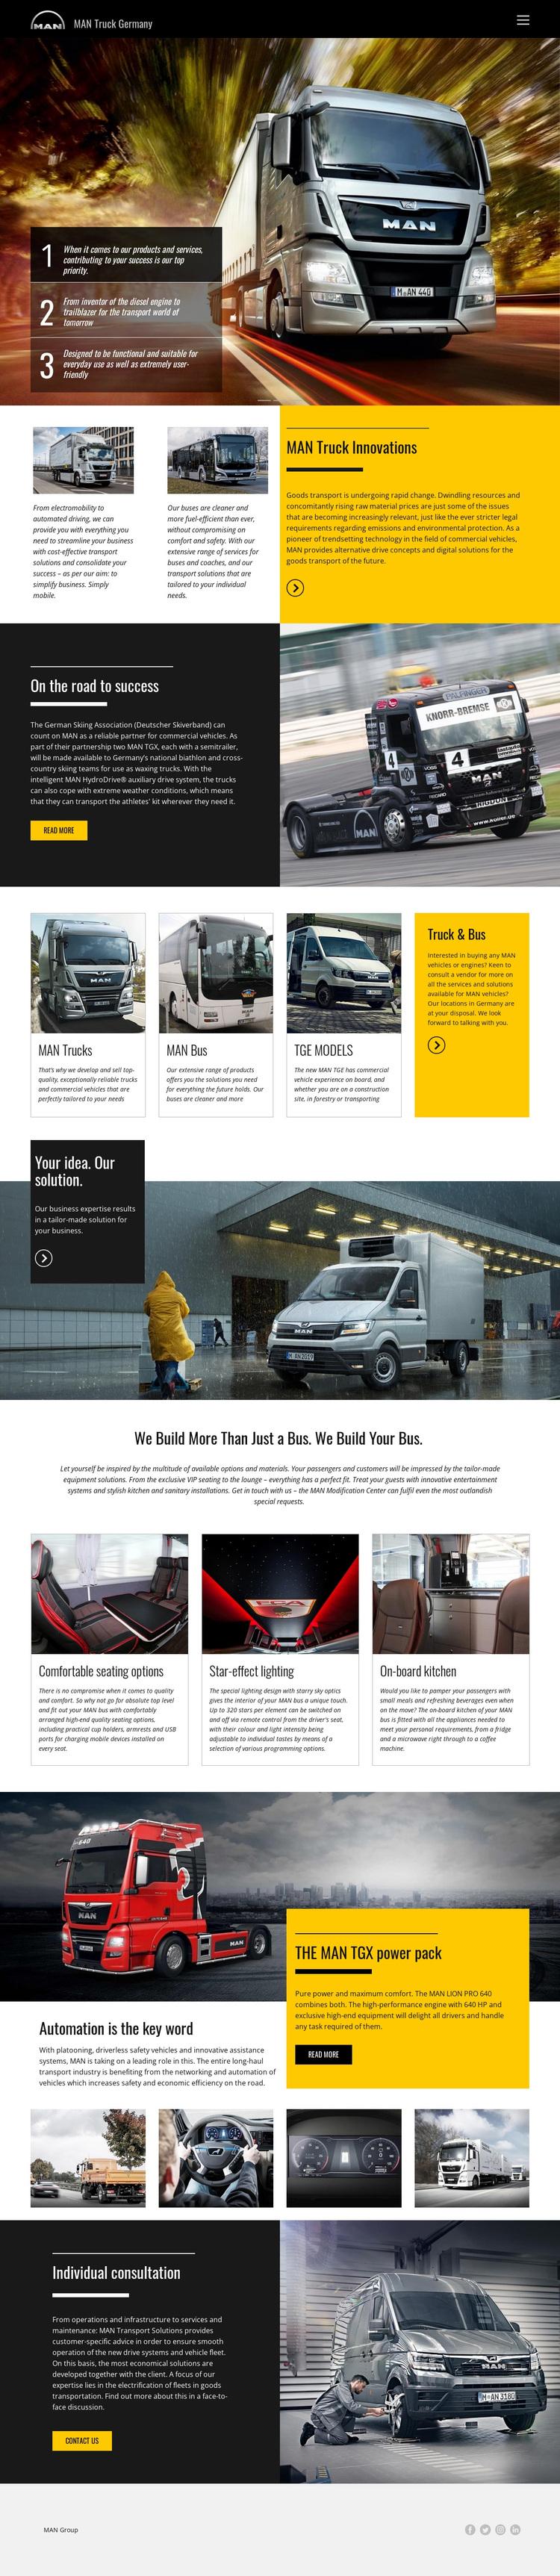 Man trucks for transportation Joomla Page Builder